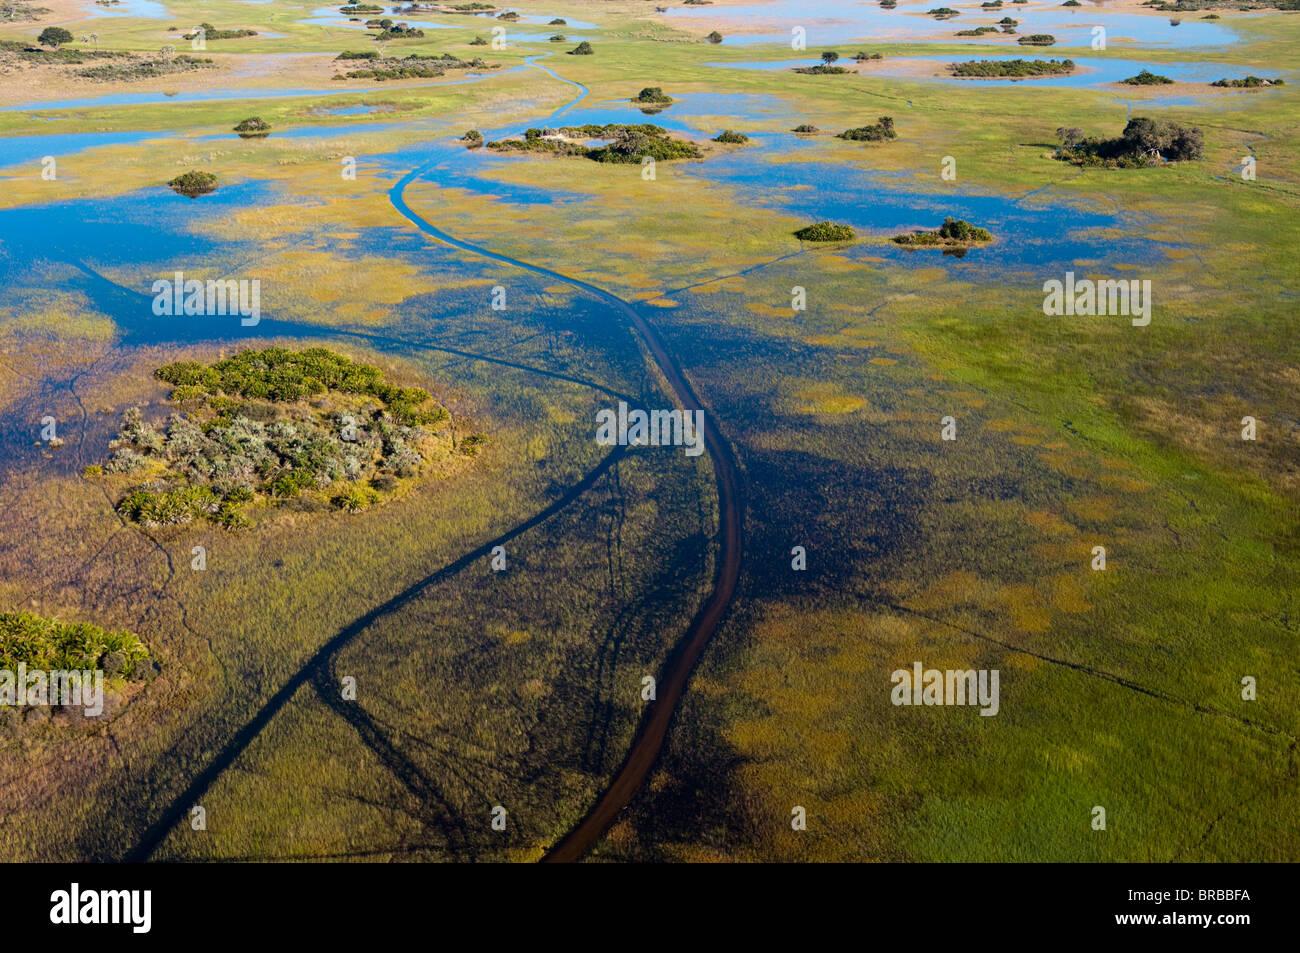 Aerial view of Okavango Delta, Botswana - Stock Image